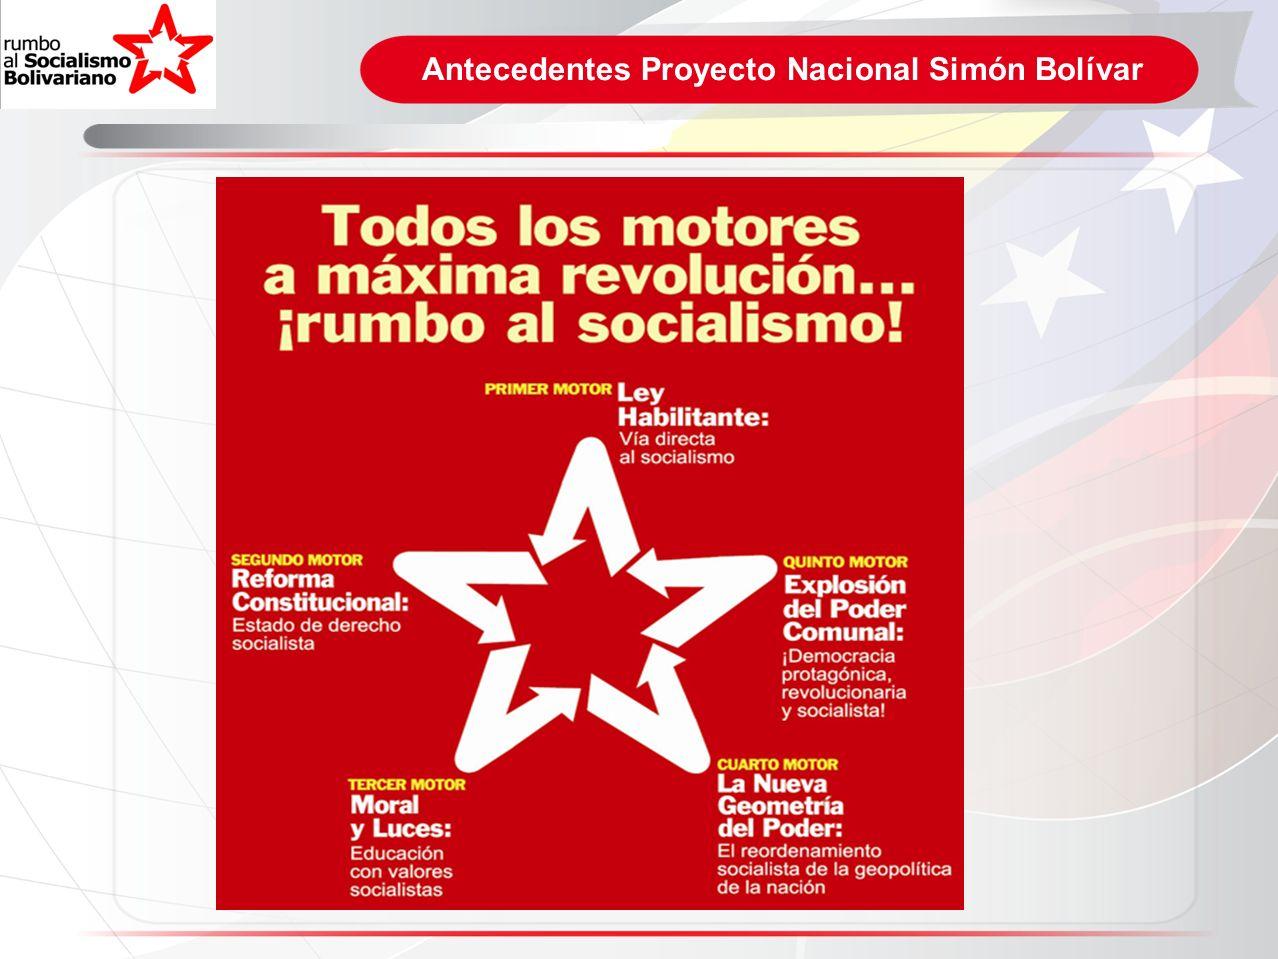 Antecedentes Proyecto Nacional Simón Bolívar Alcancemos la Justicia Social